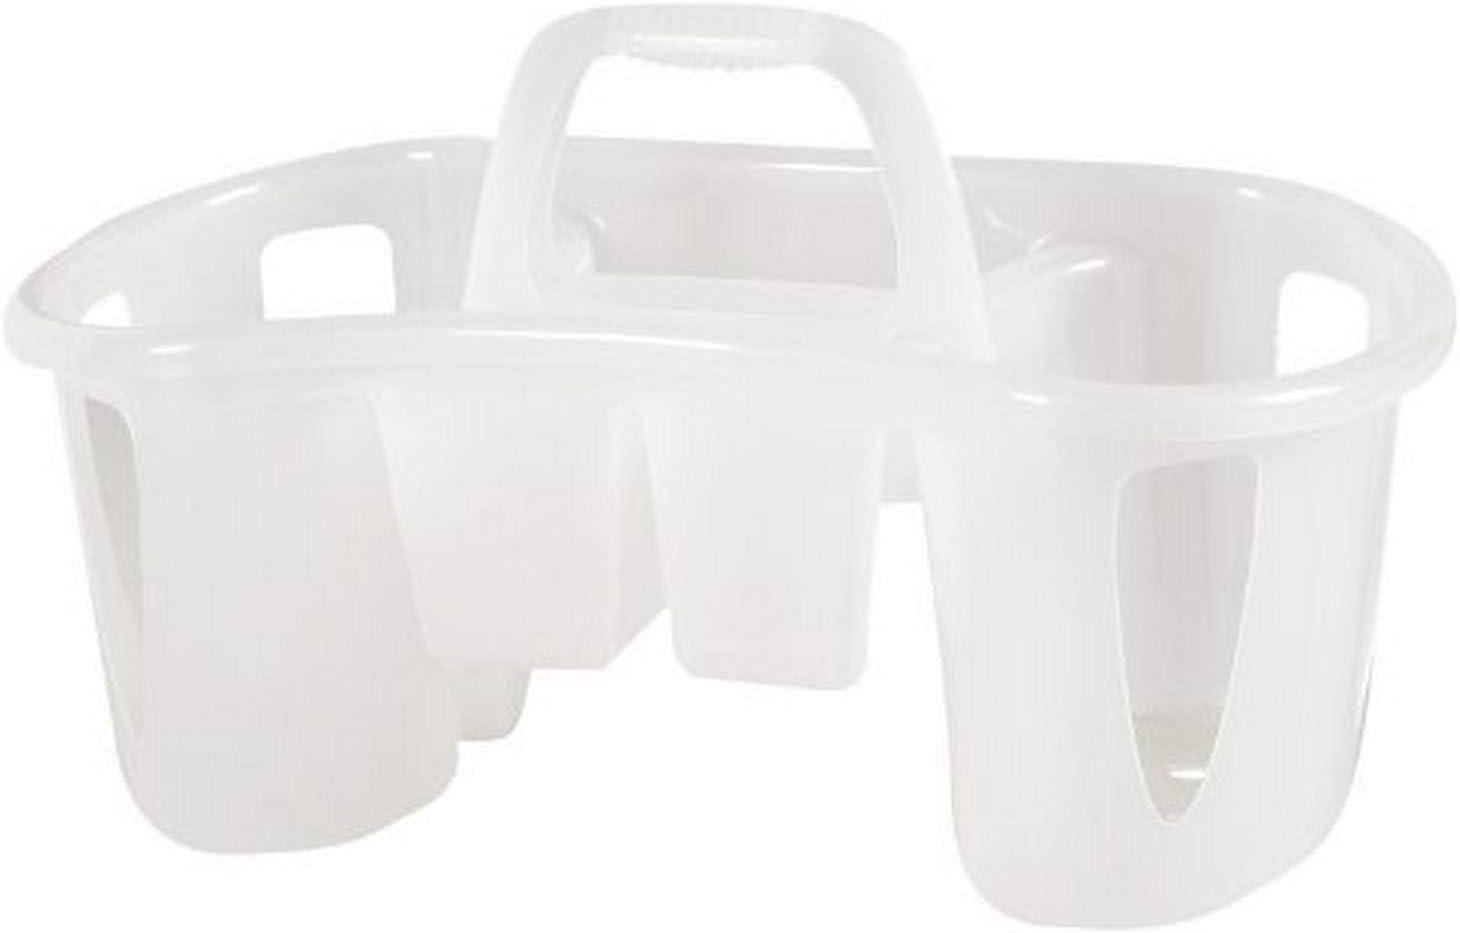 Creative Bath Products Shower/Tub Dorm Caddy Tote